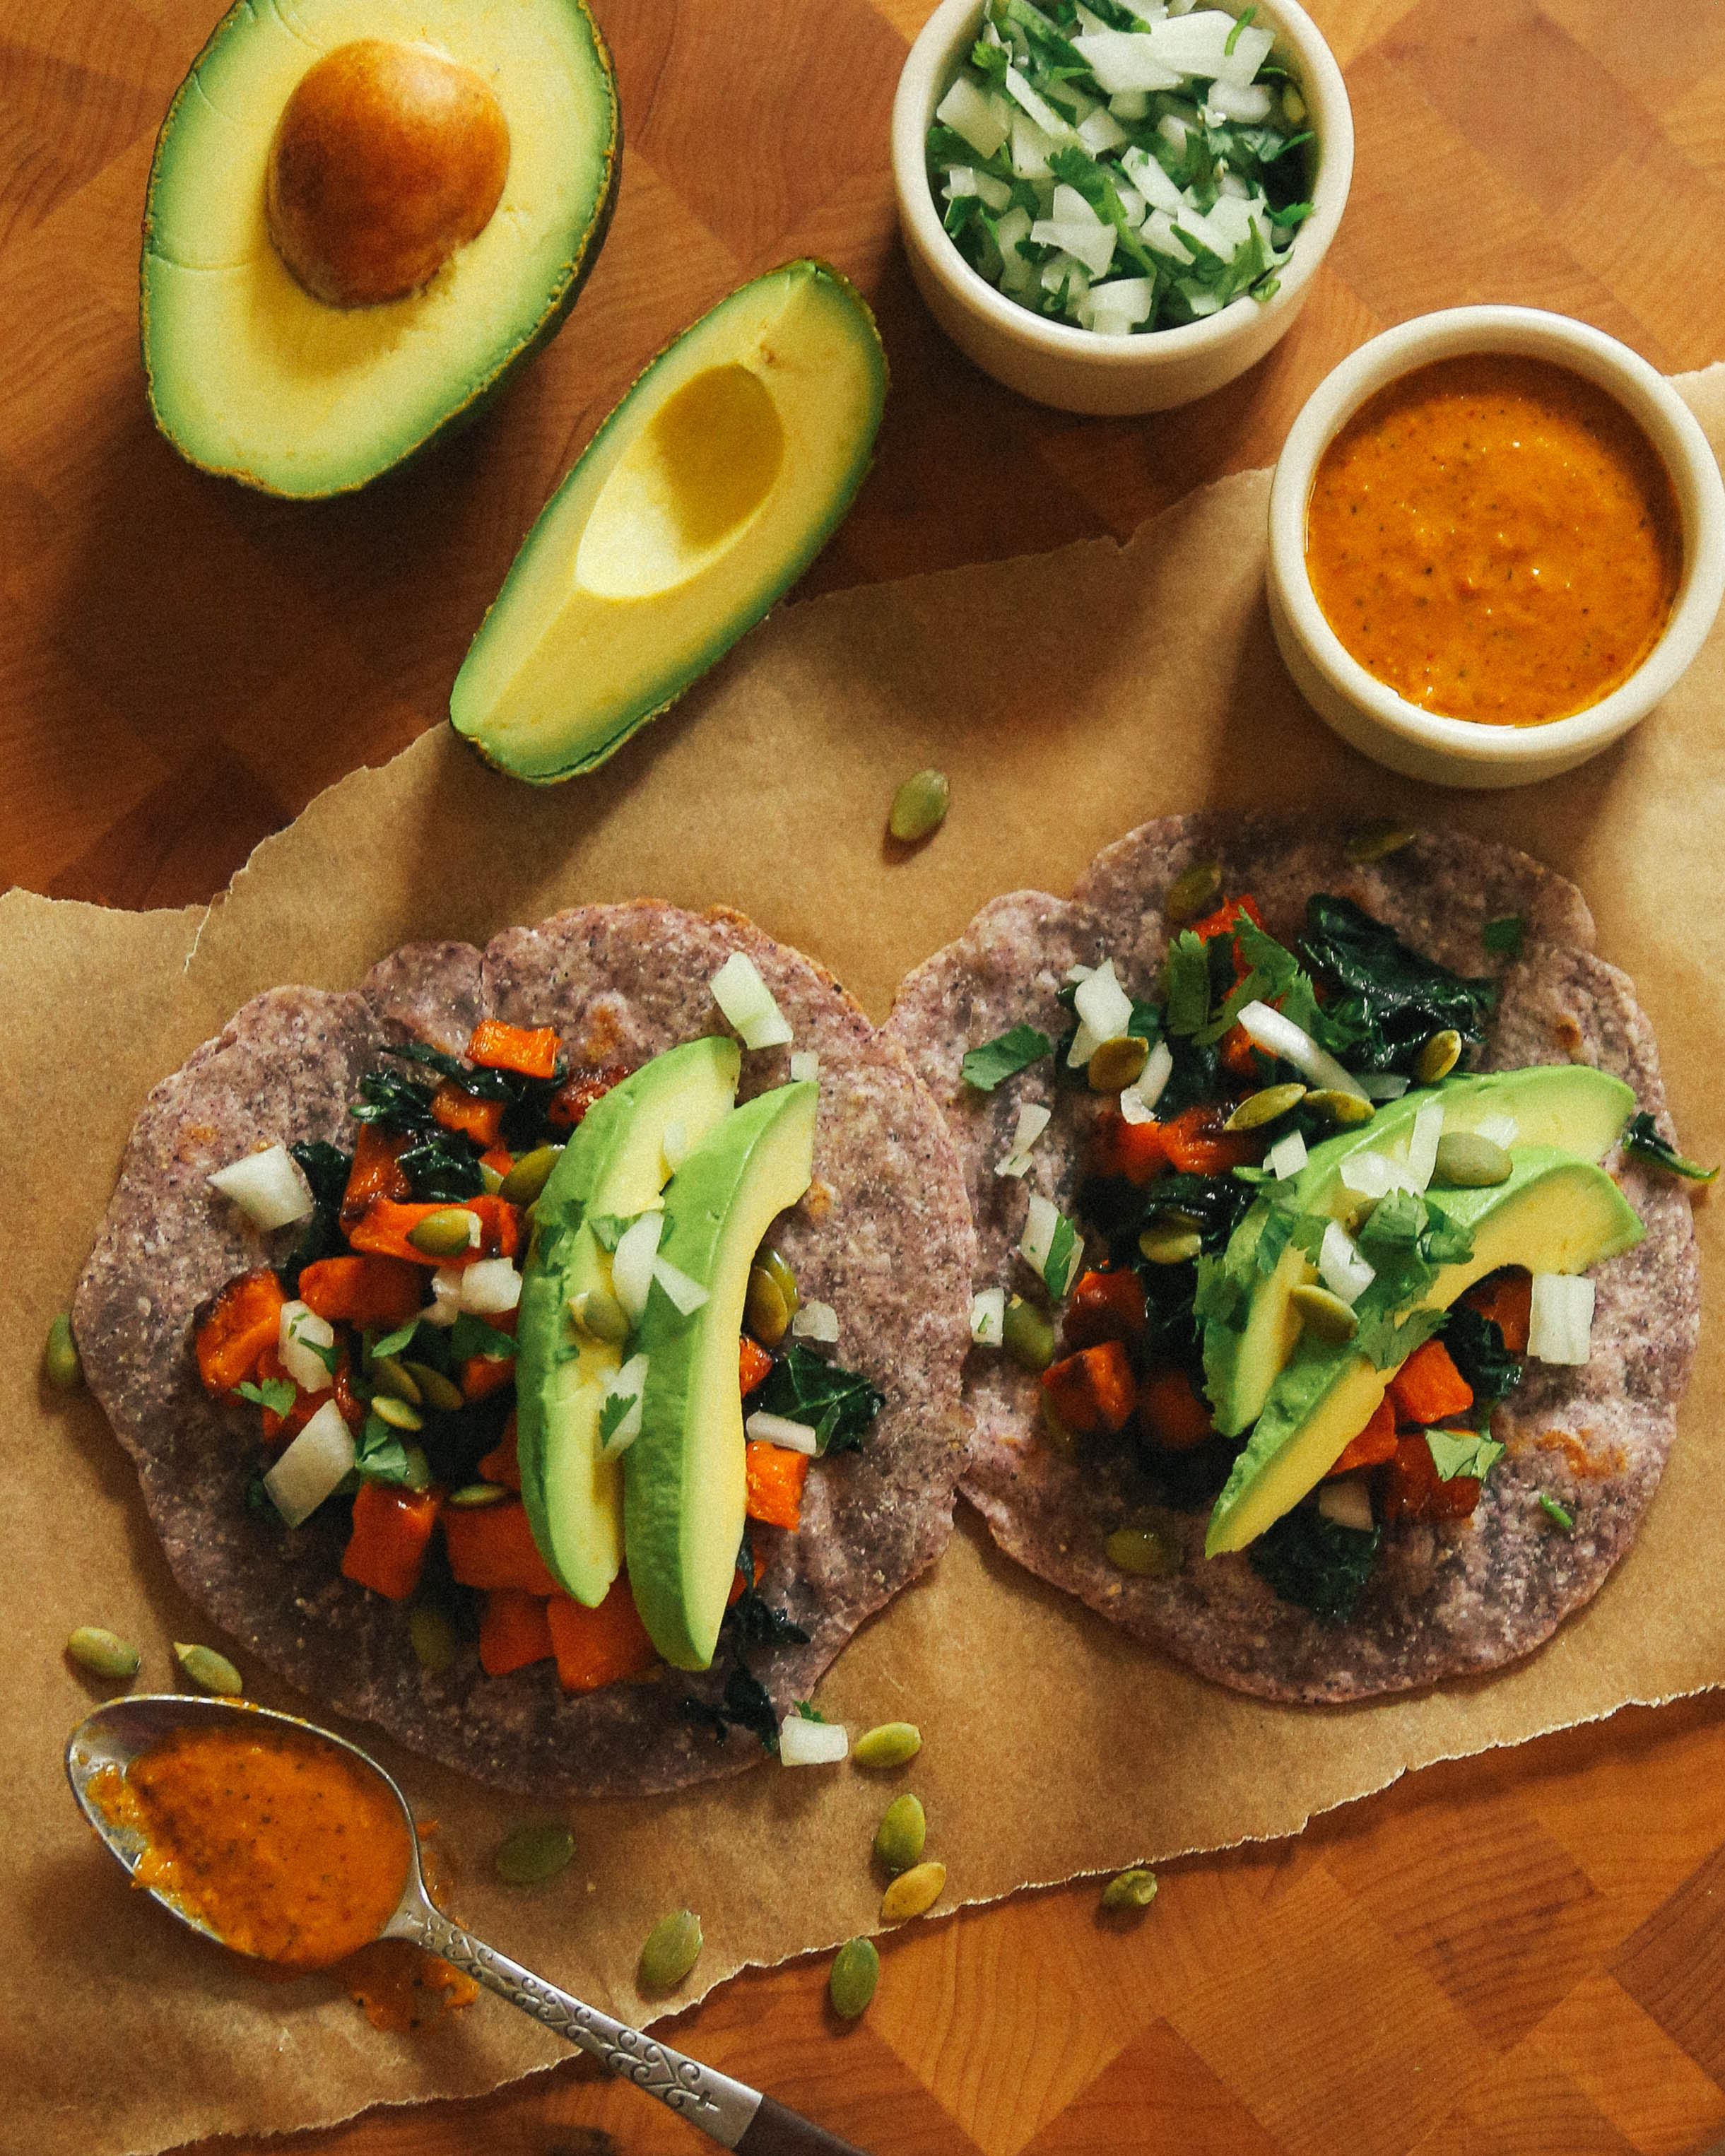 vegan vegetable tacos with aji amarillo sauce